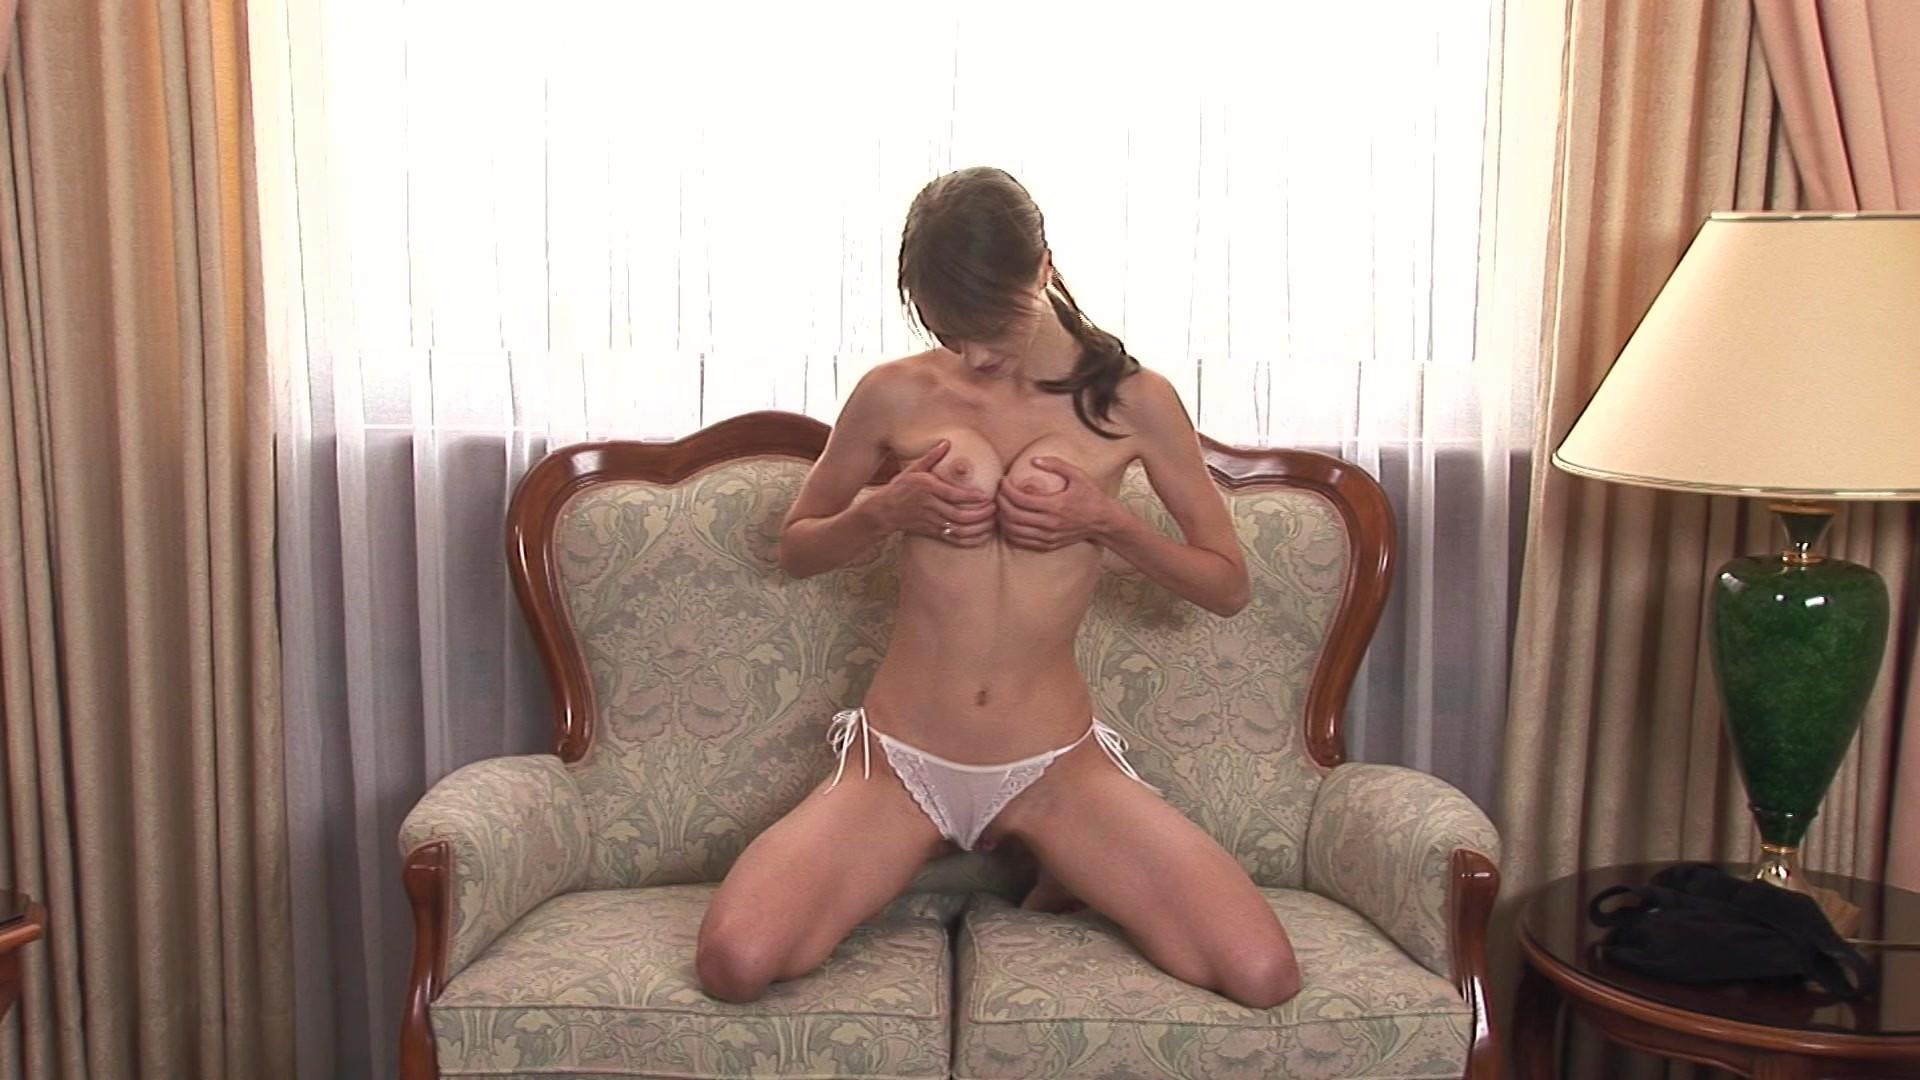 Maravilhosa!! sex carnage 3 has incredible